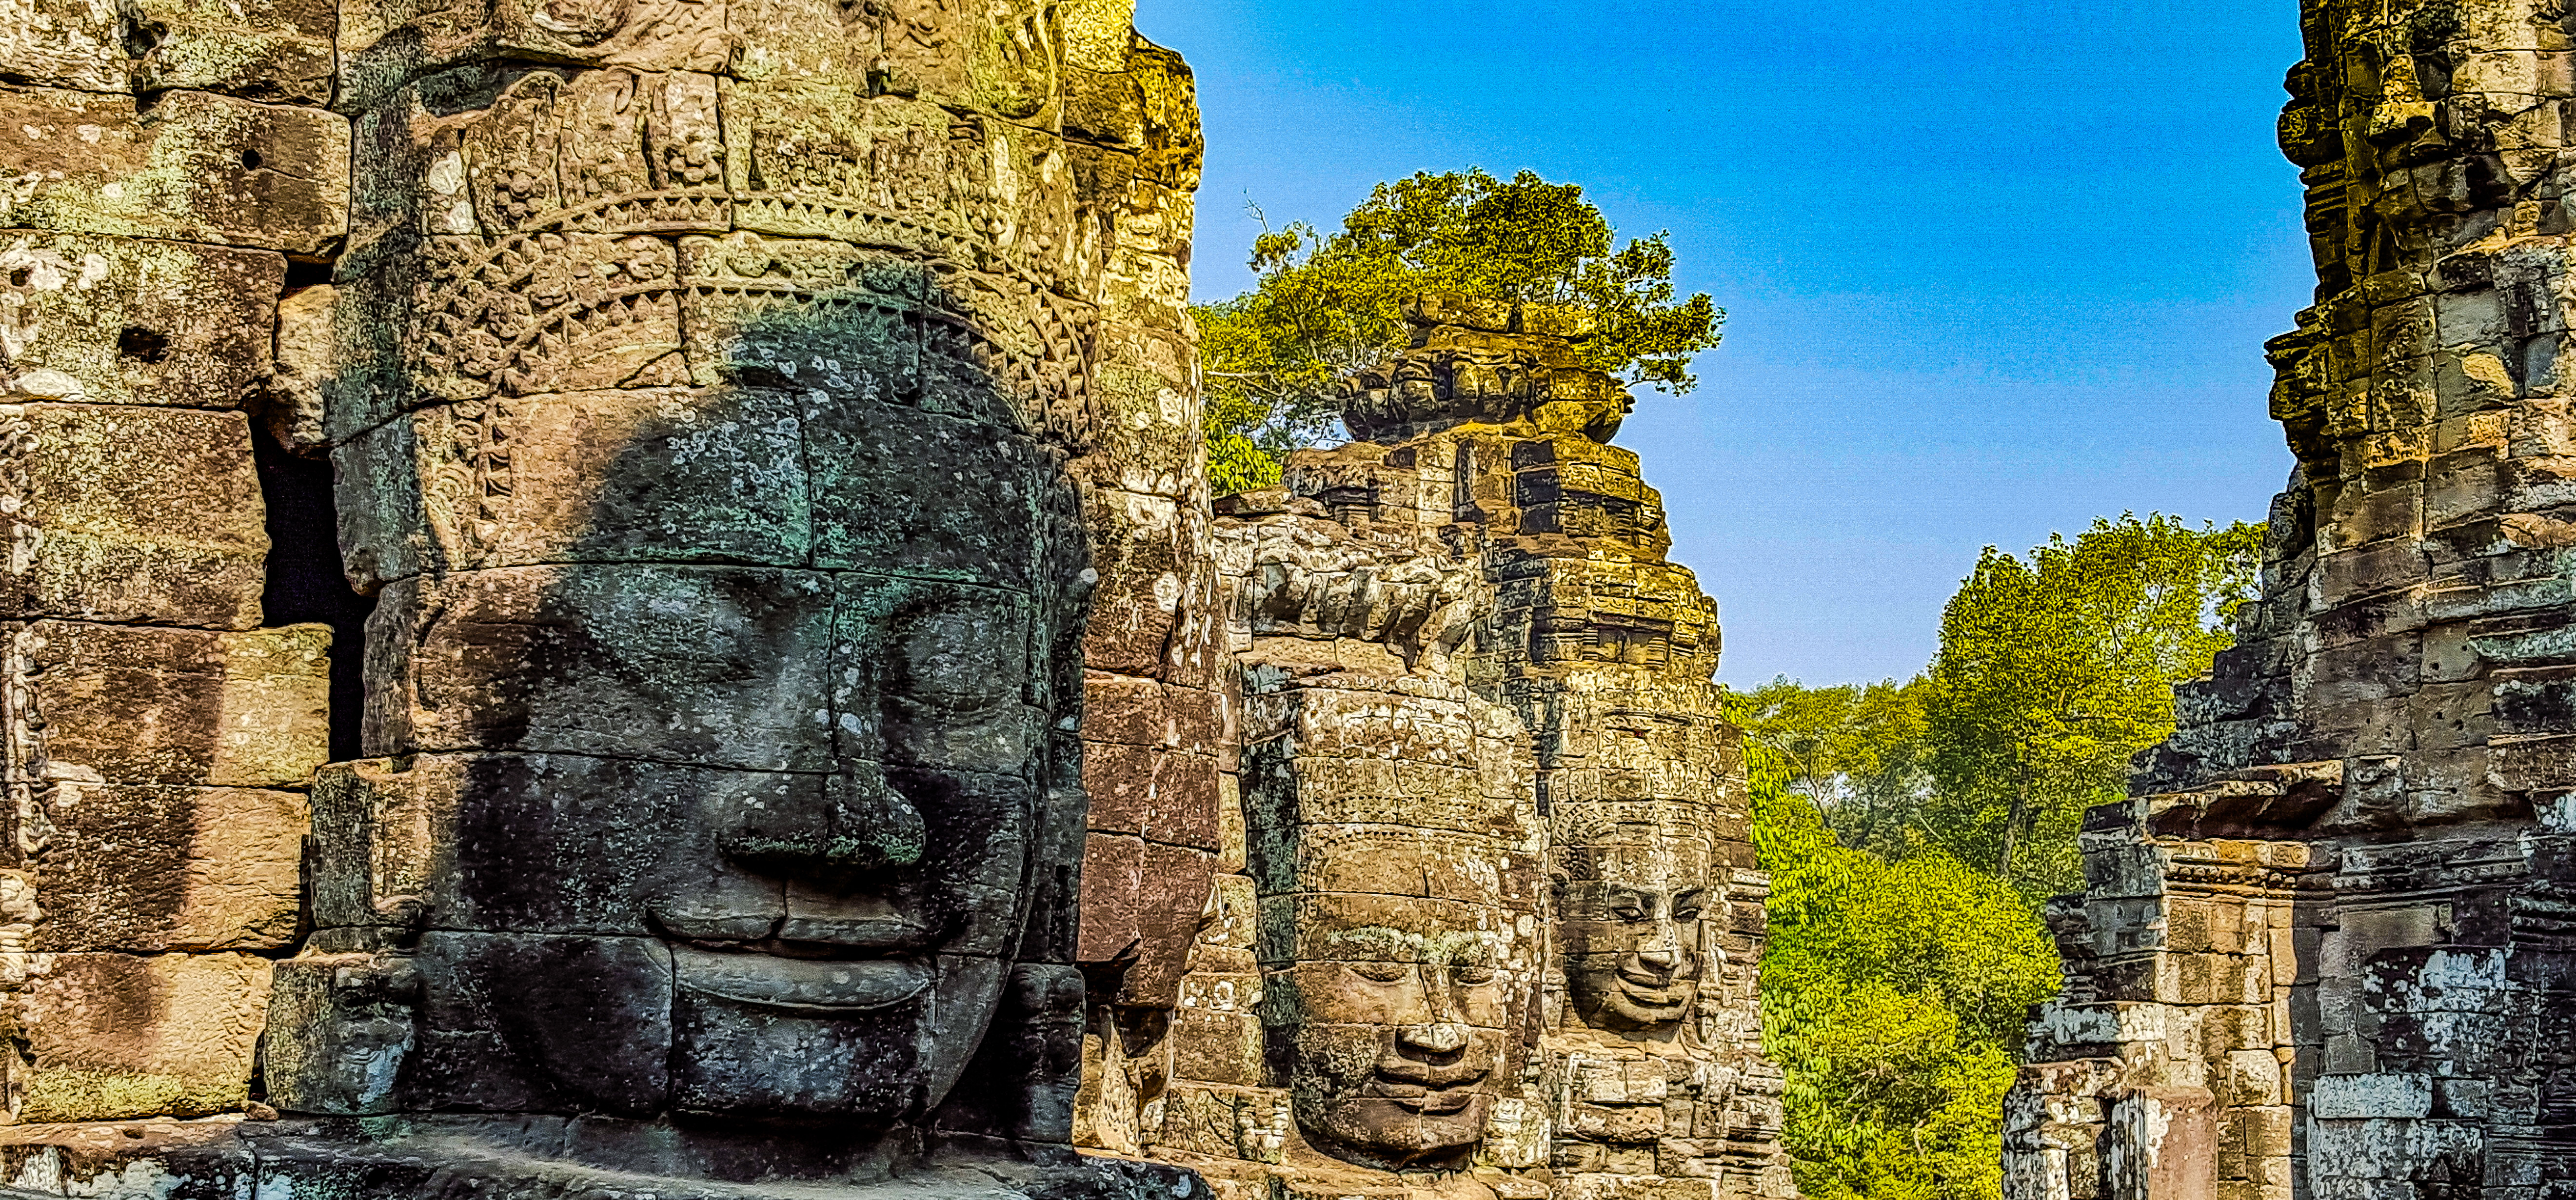 Cambogia templi di Angkor